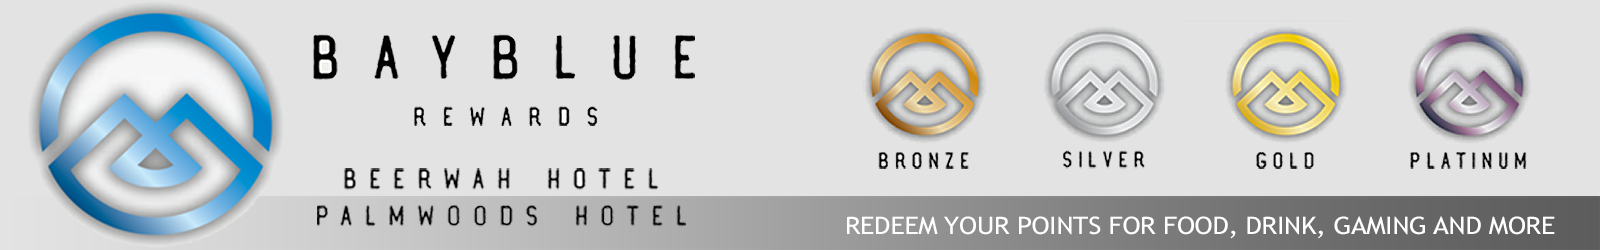 BayBlue-Rewards-1.png